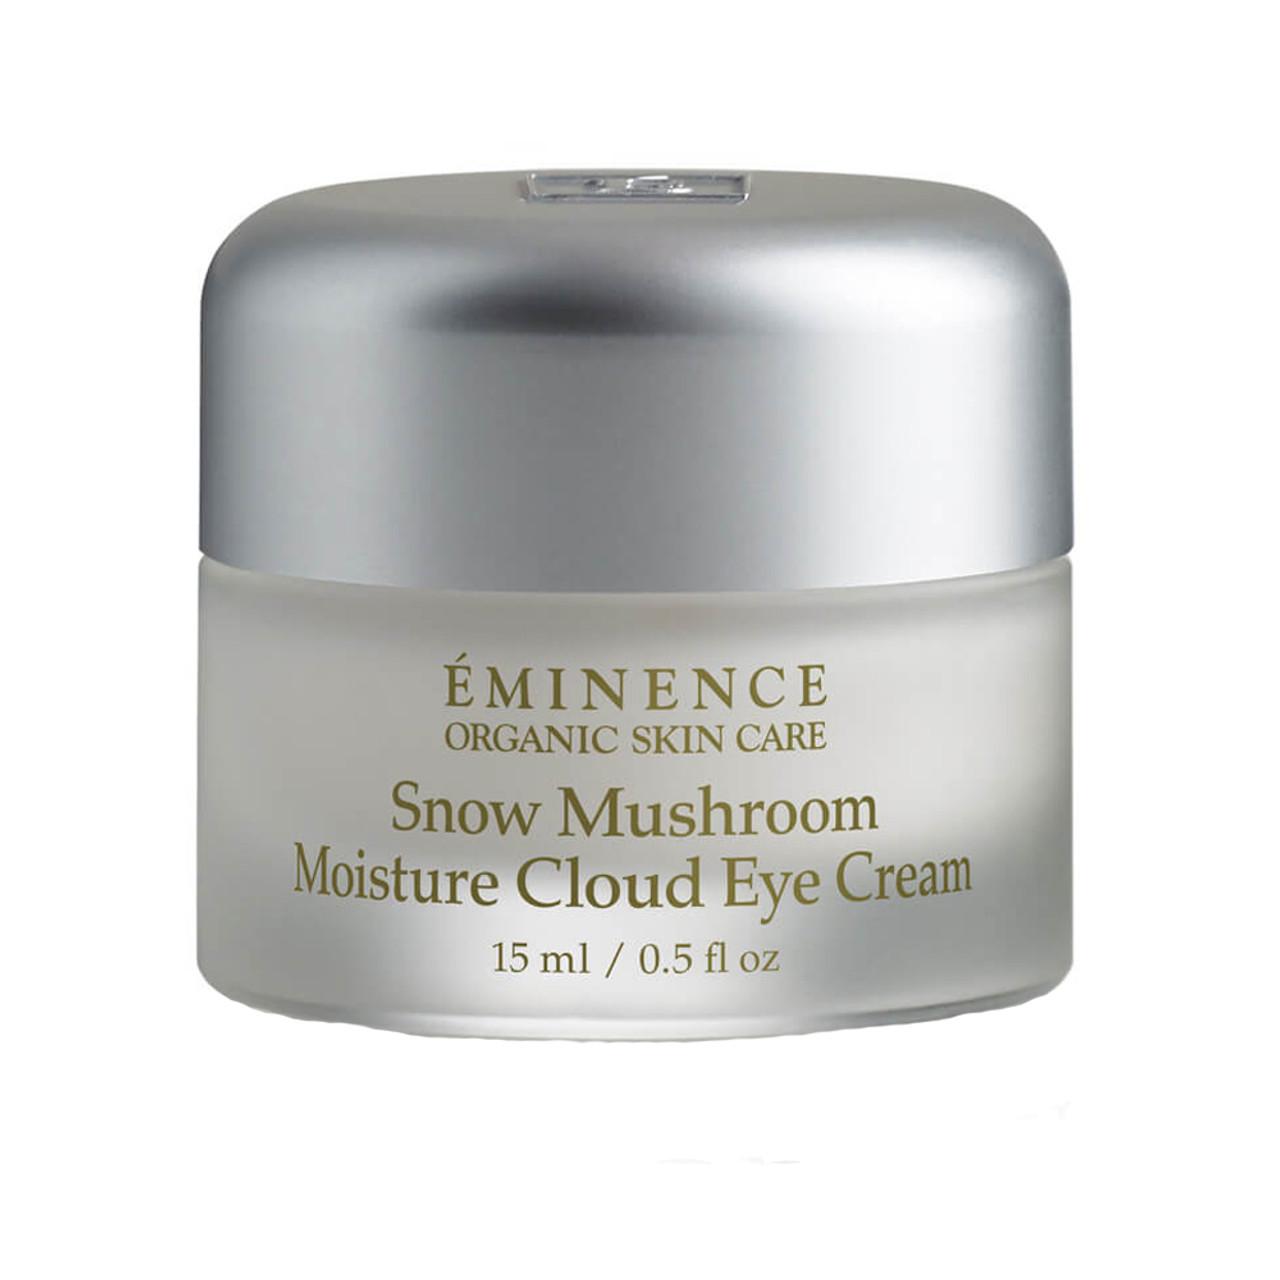 Eminence Snow Mushroom Moisture Cloud Eye Cream